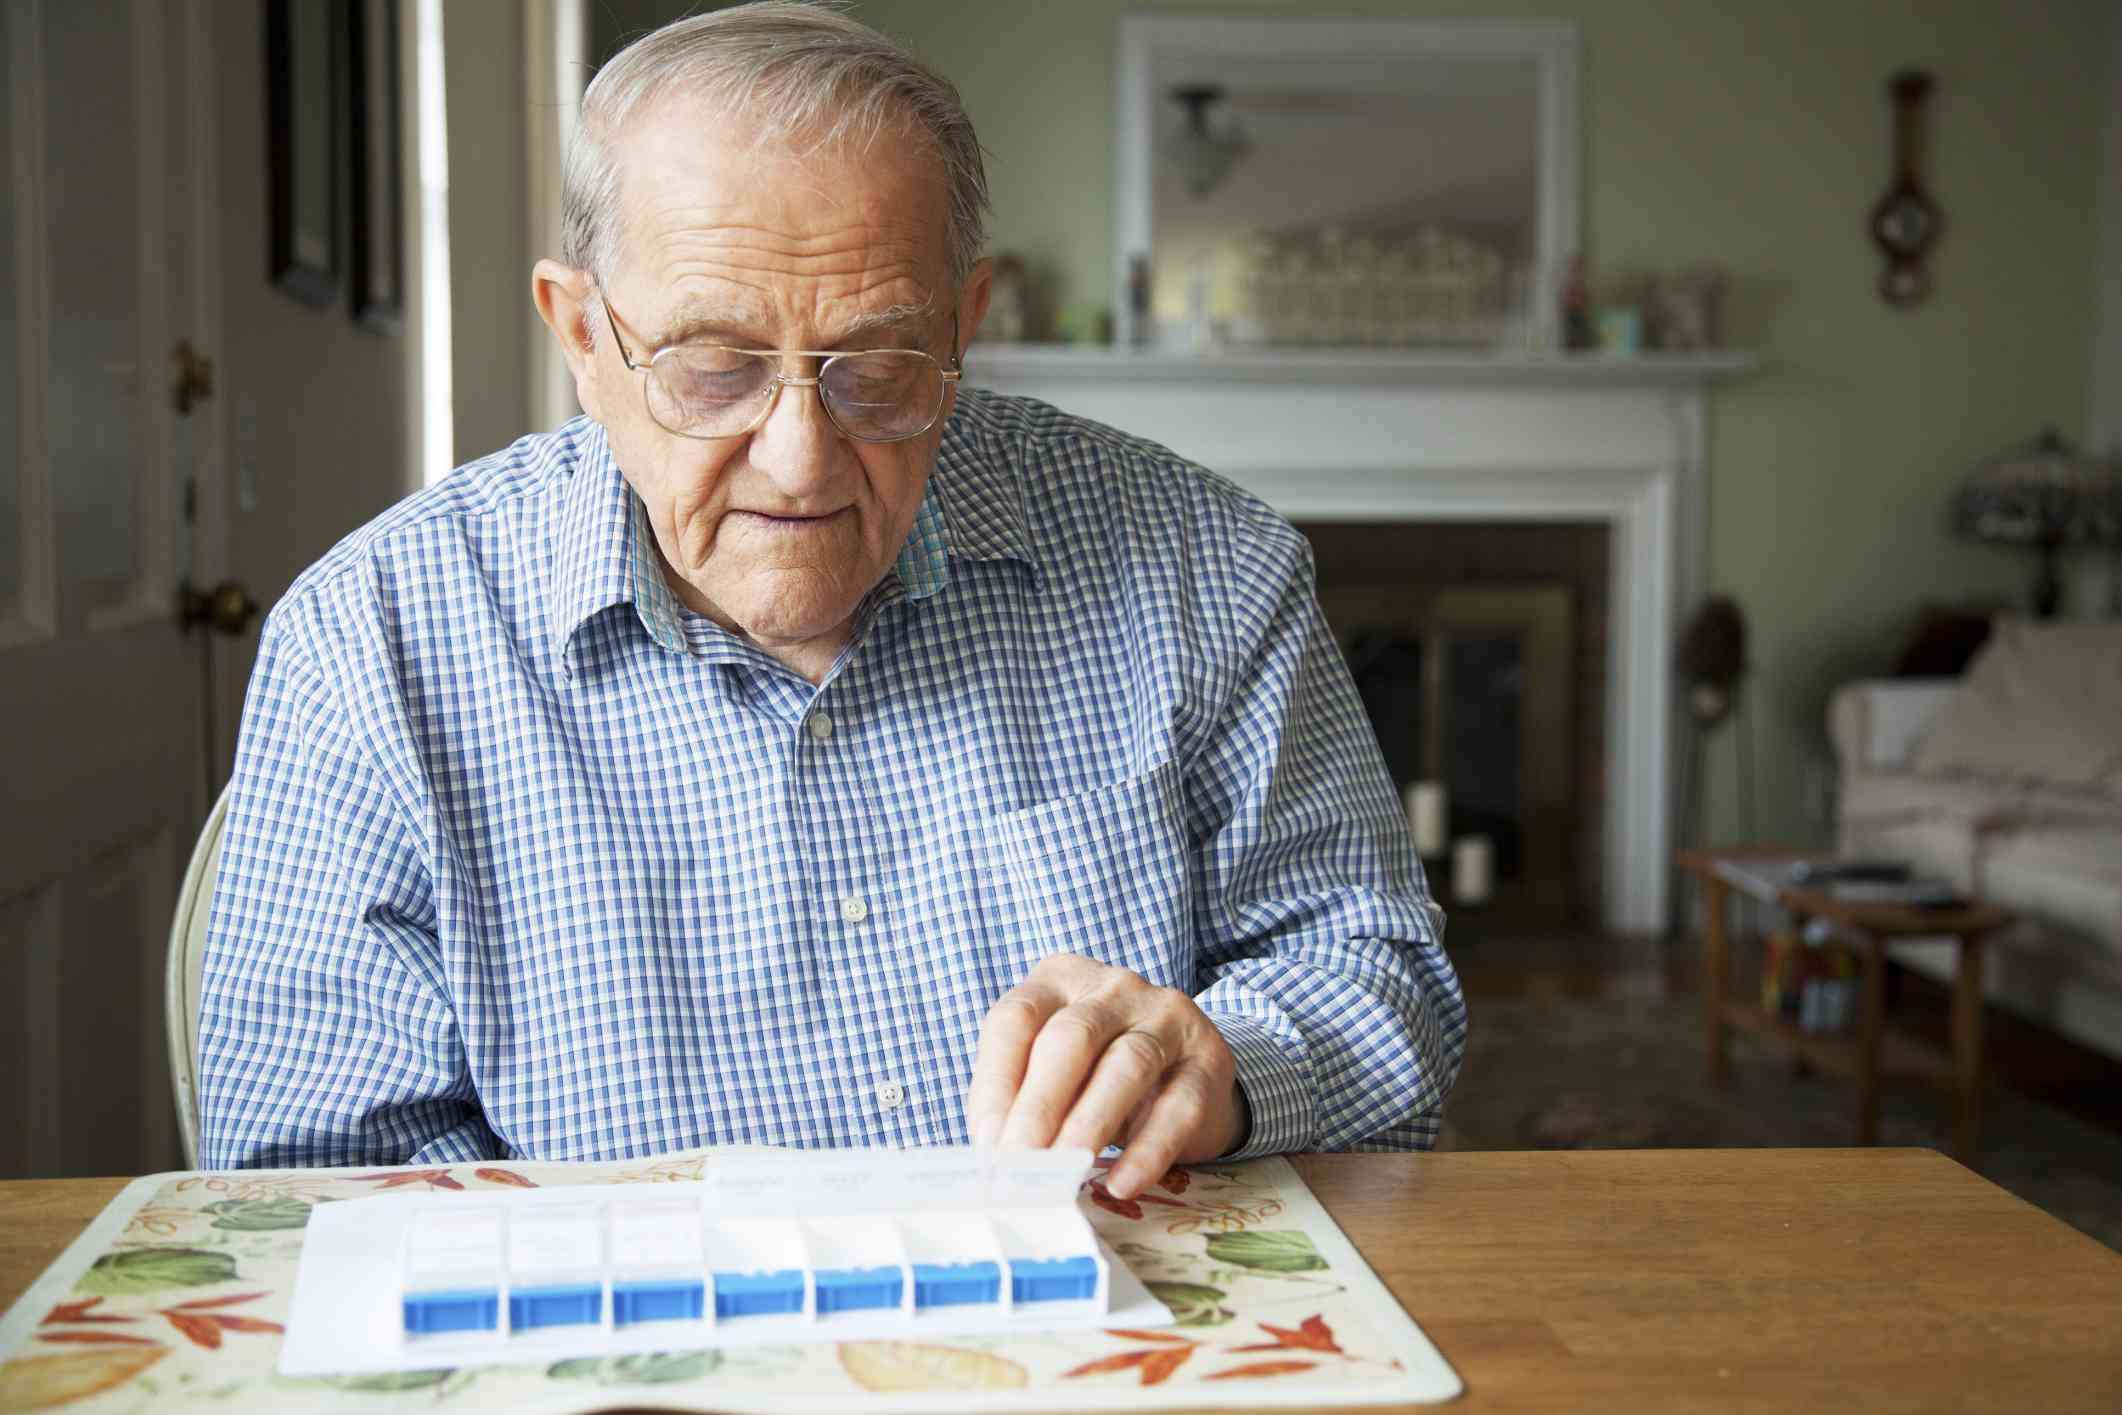 elderly main looking at pill box